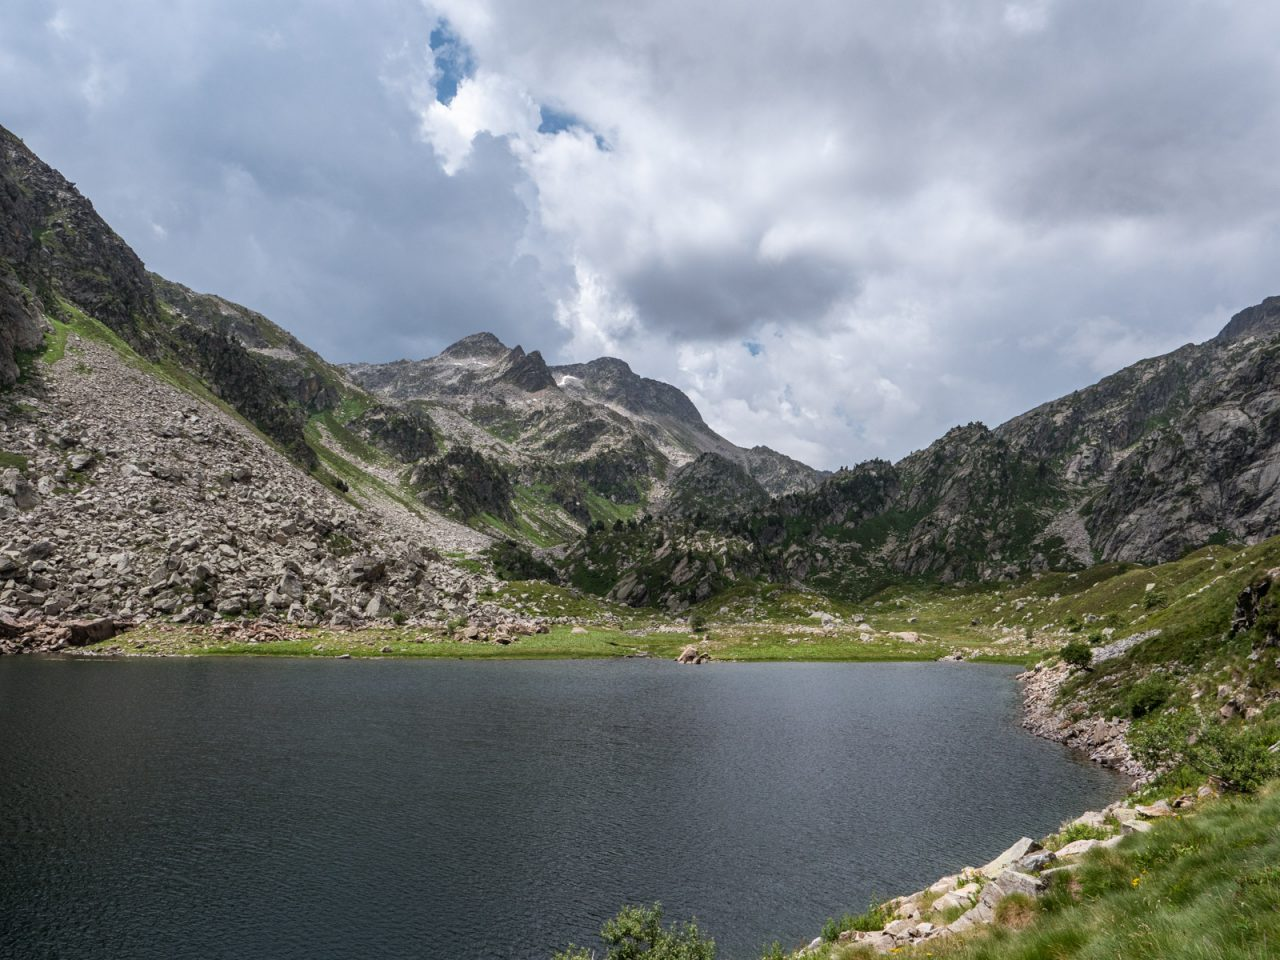 Wandeling in de Vallée d'Orlu